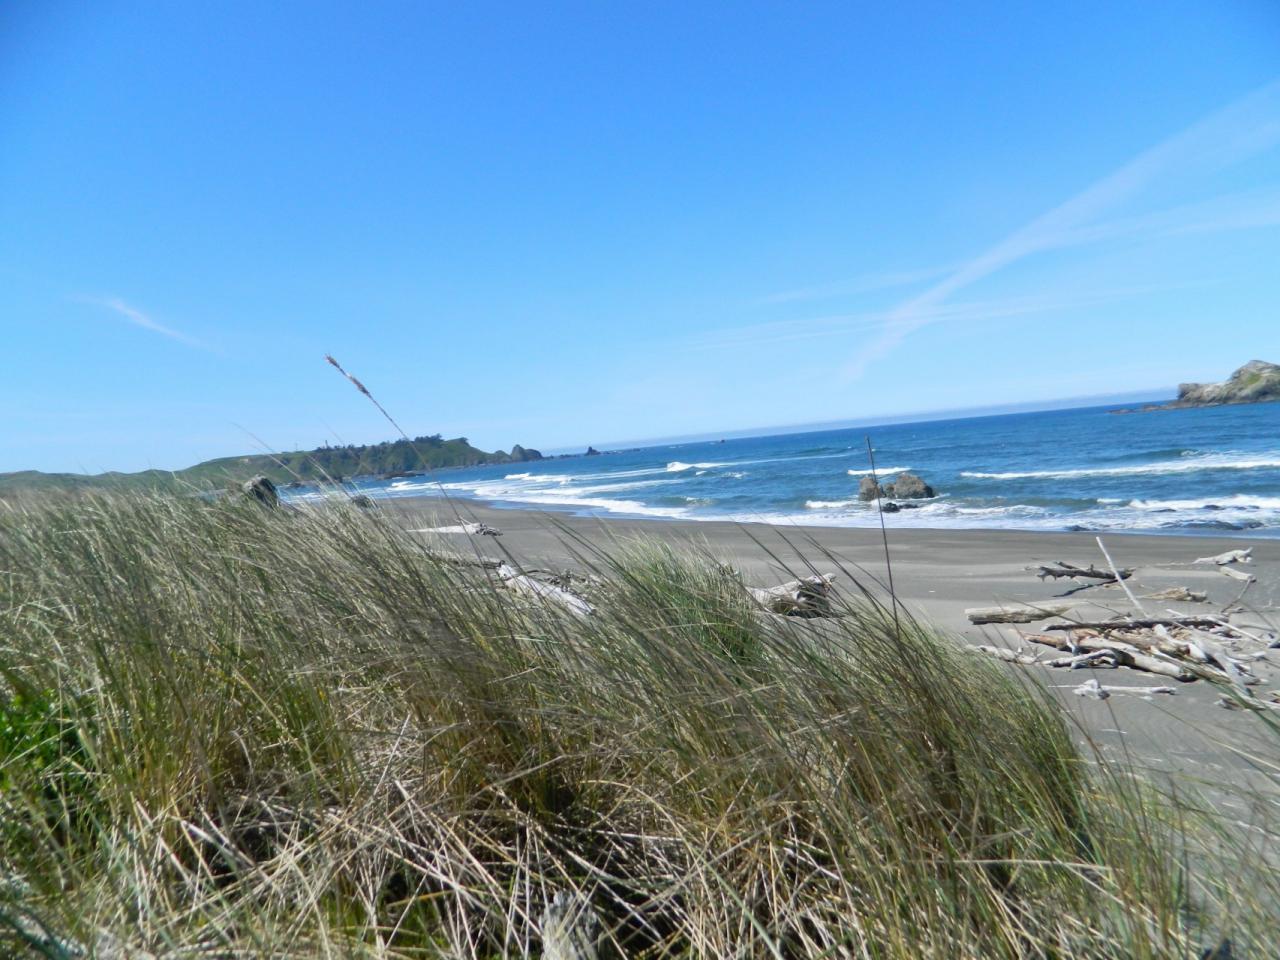 4/28/13 Cape Blanco North on MILE 57.